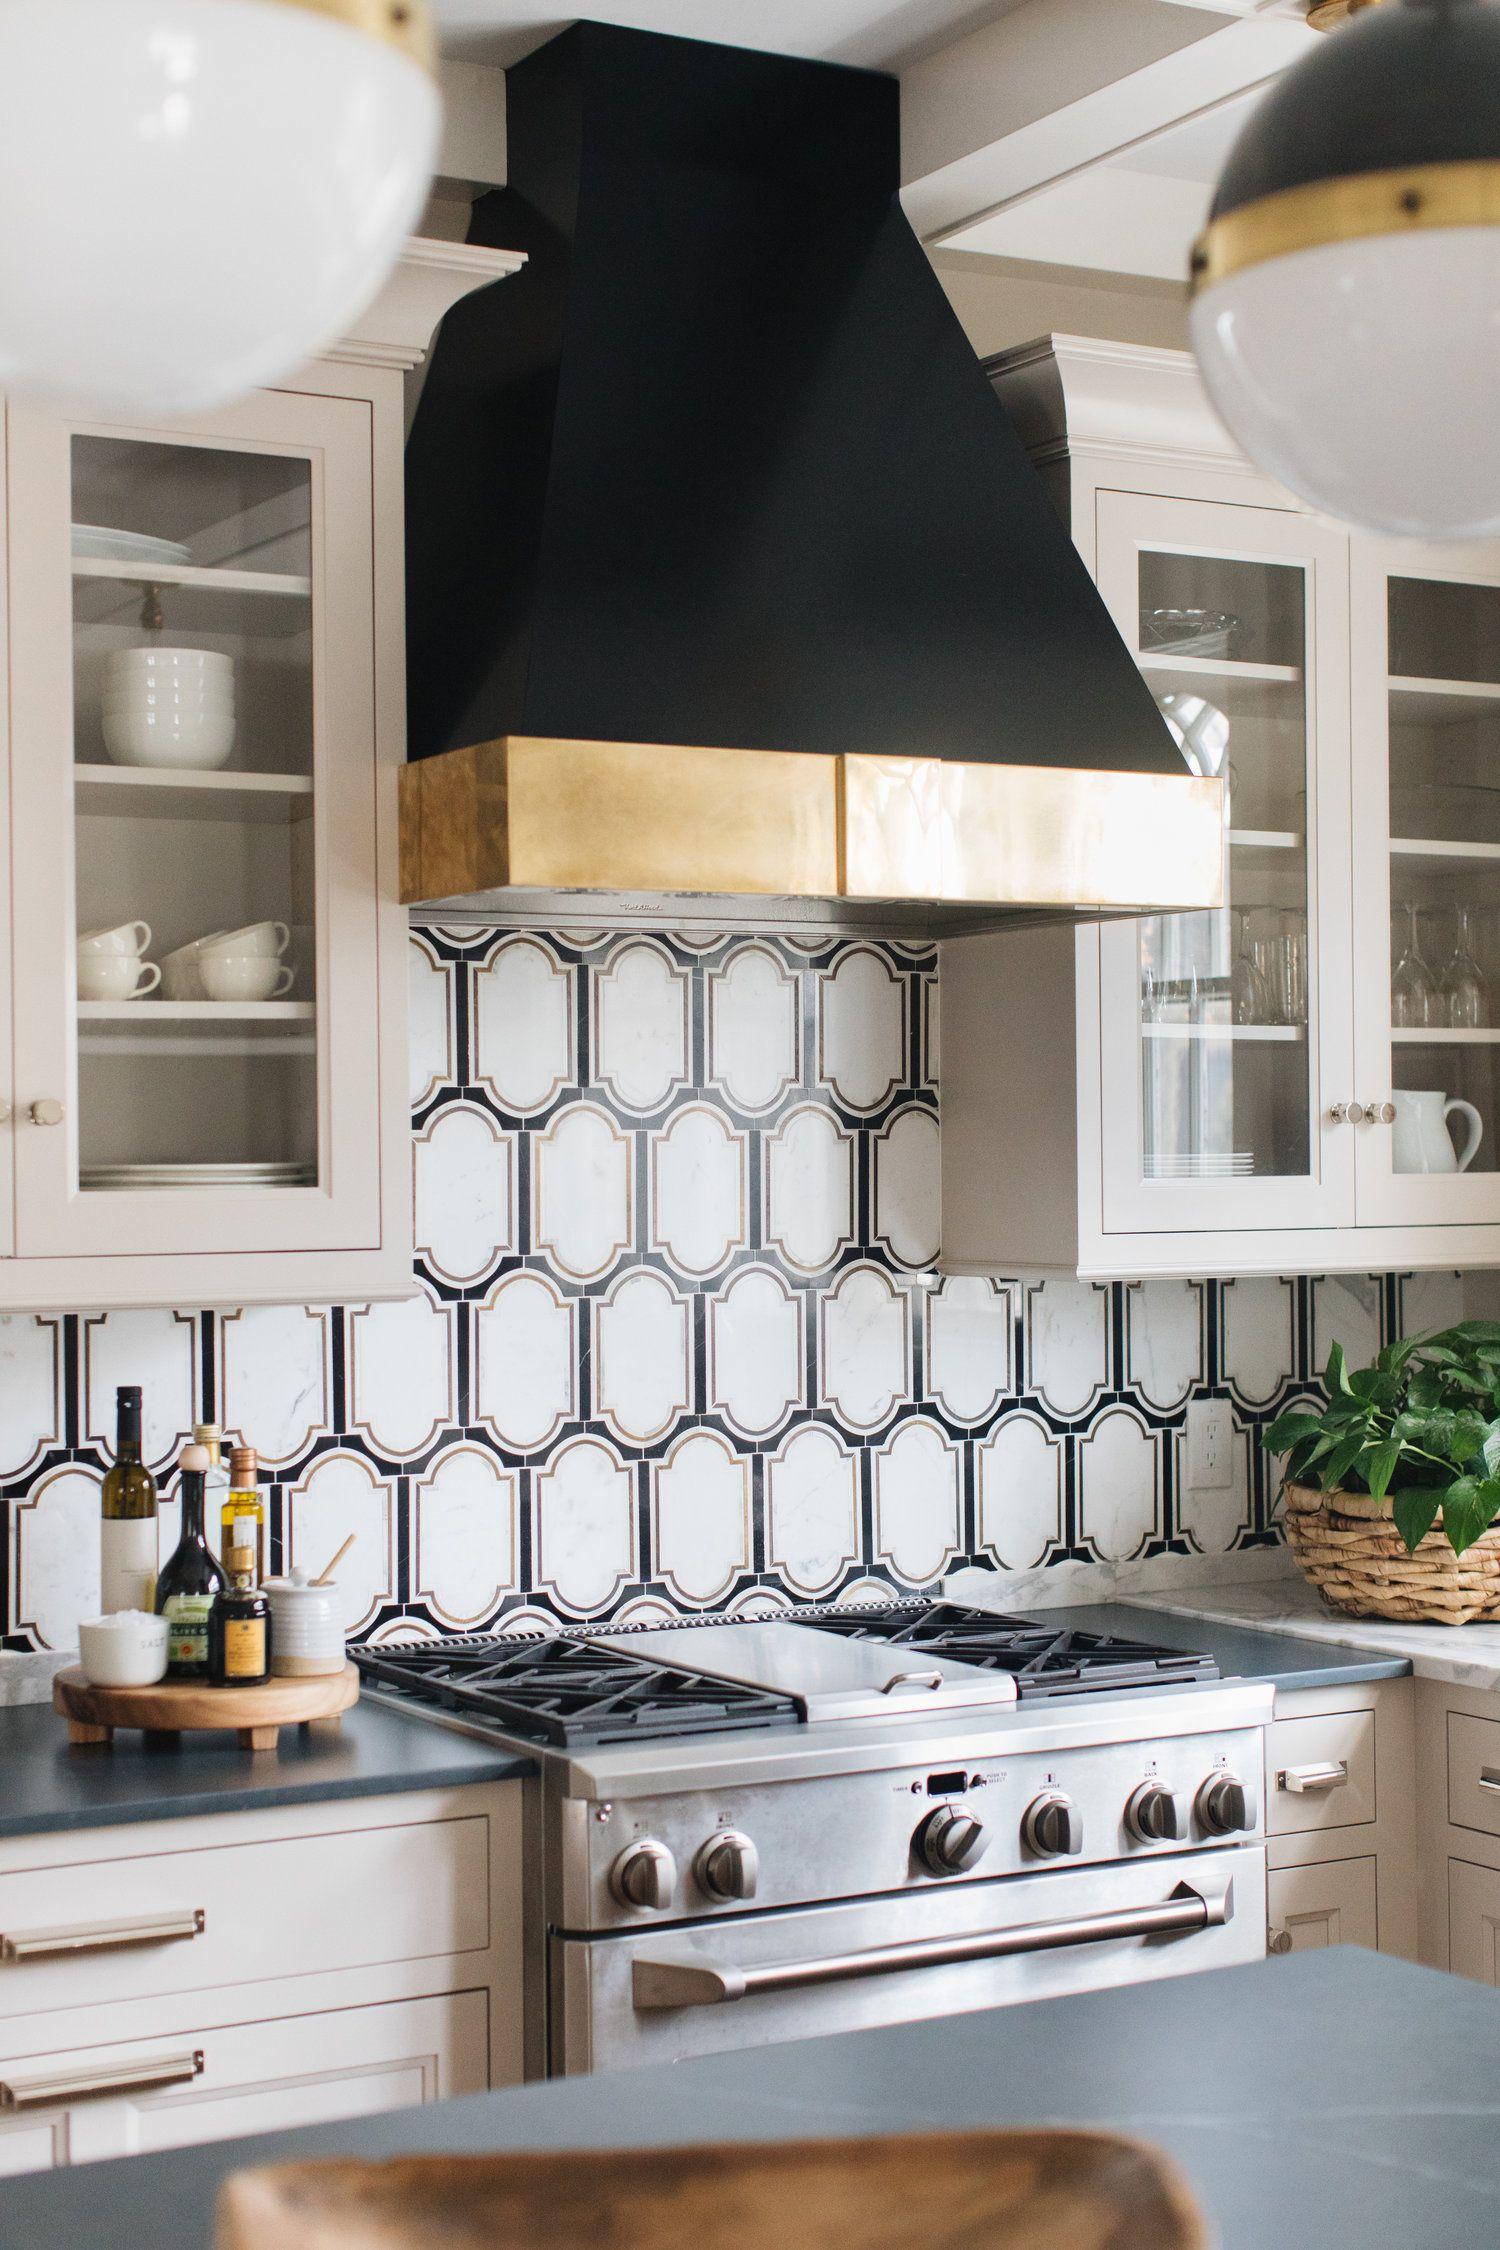 Jean Stoffer Design Victorian 1902 Backsplash Thinking Of Using This Or Something Similar For The Black Kitchen Decor Geometric Kitchen Simple Kitchen Design